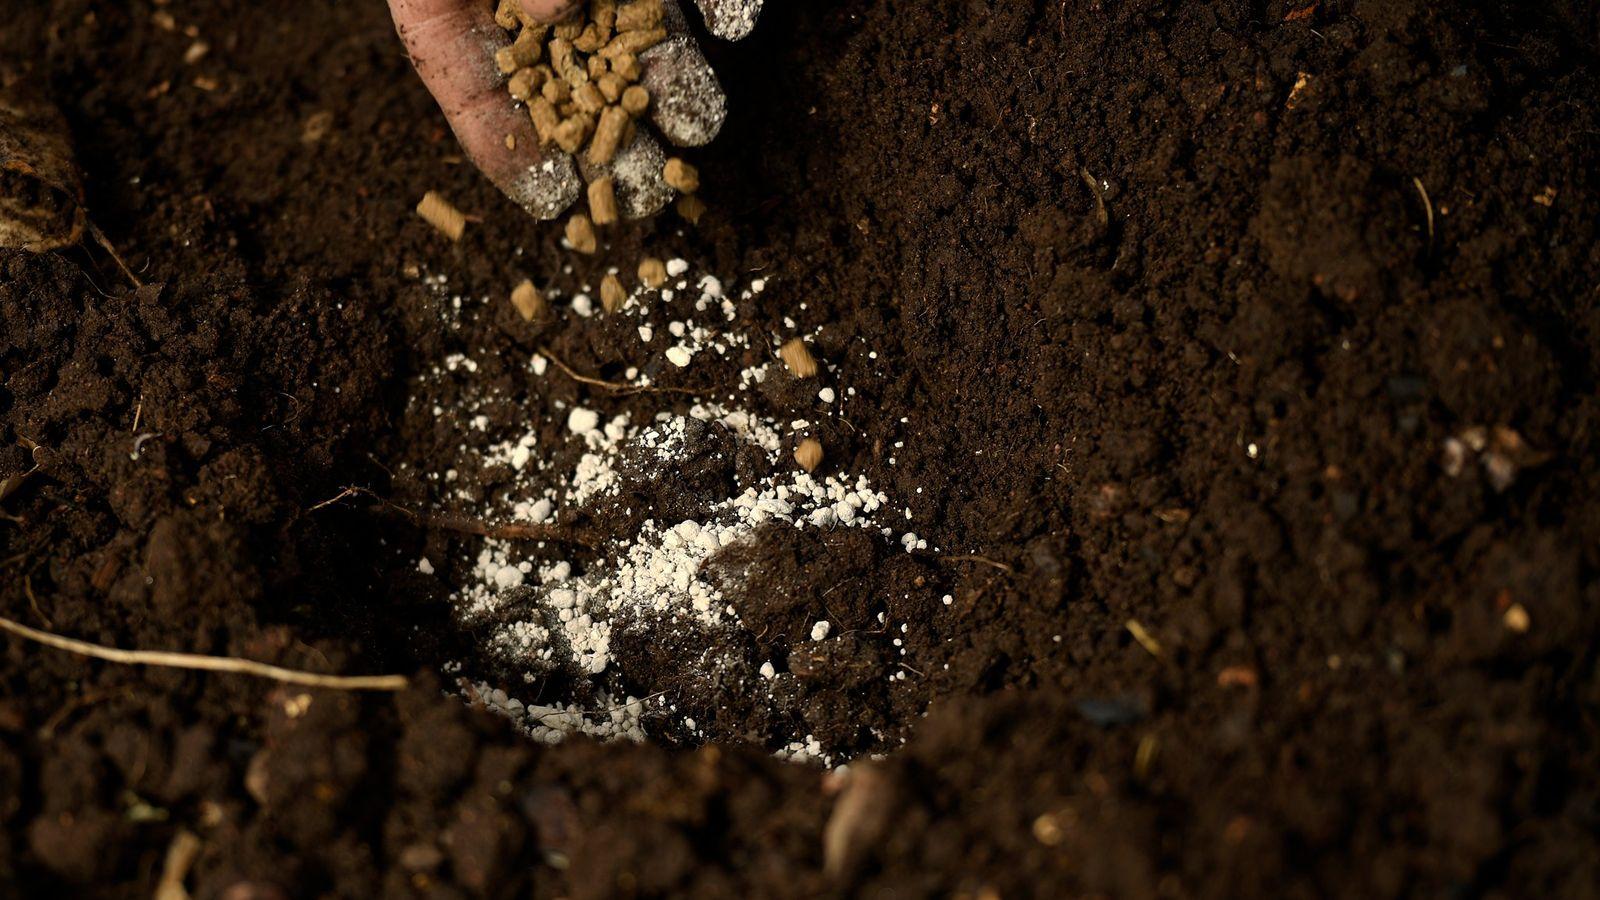 Un agricultor extiende fertilizantes orgánicos